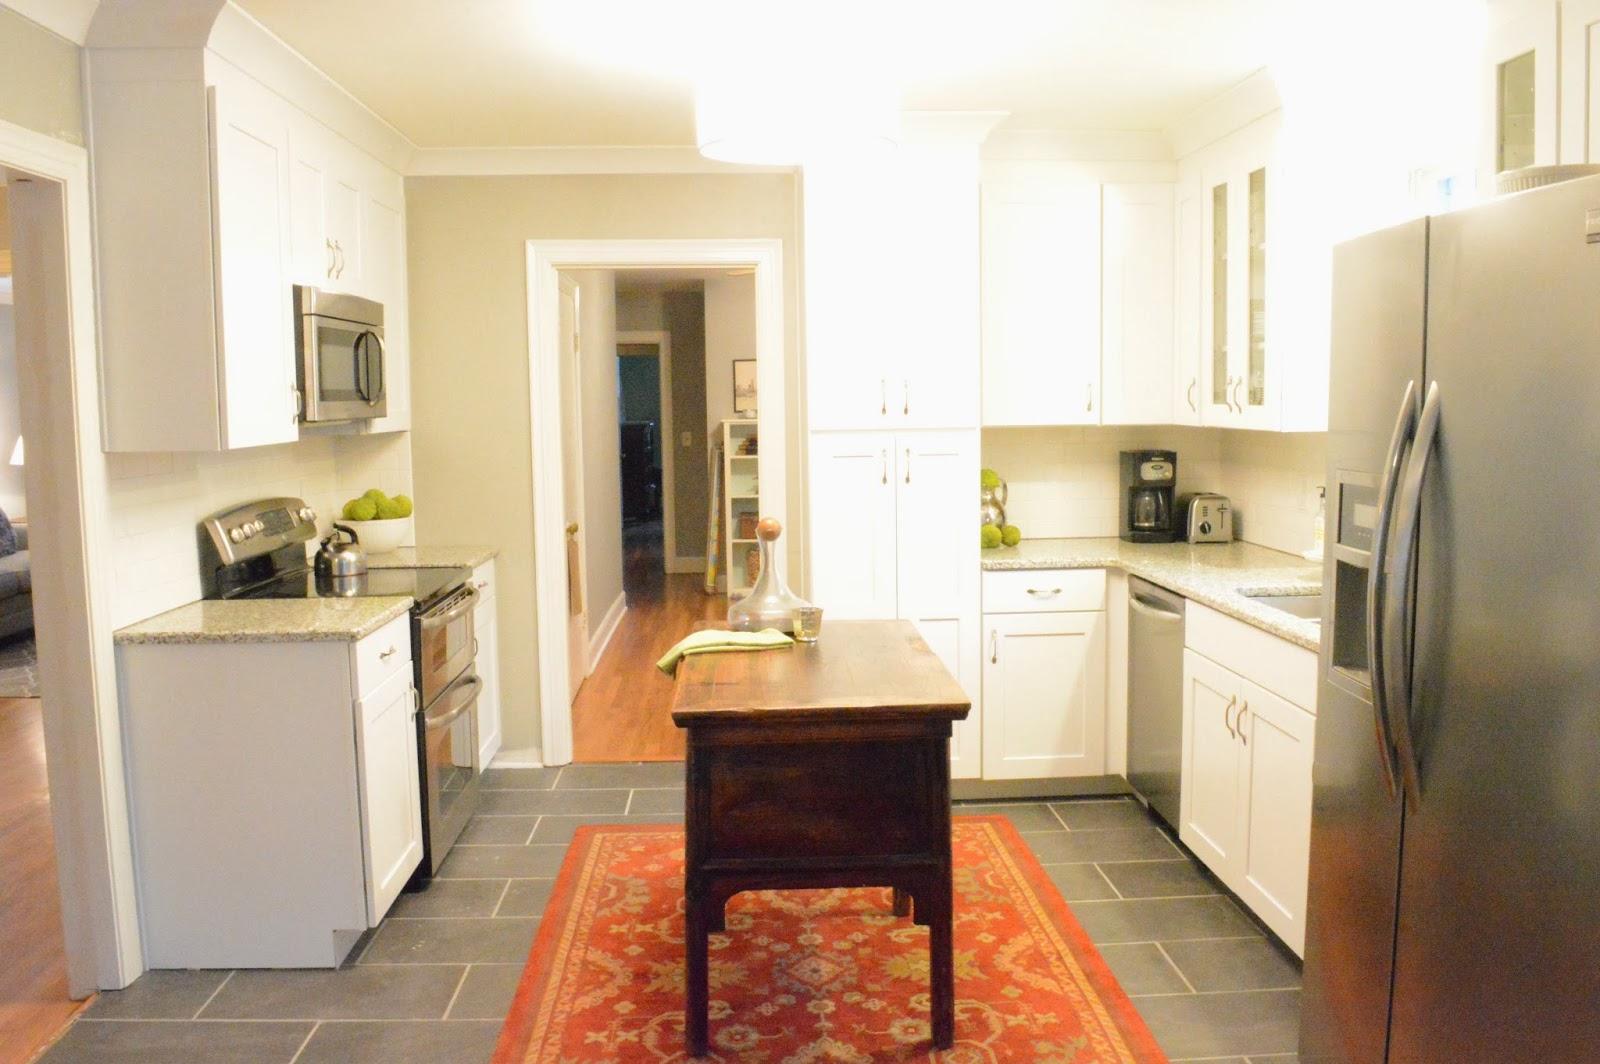 Budgeting For A Kitchen Remodel: Sylvan Park Life: Kitchen Renovation: Budget Breakdown